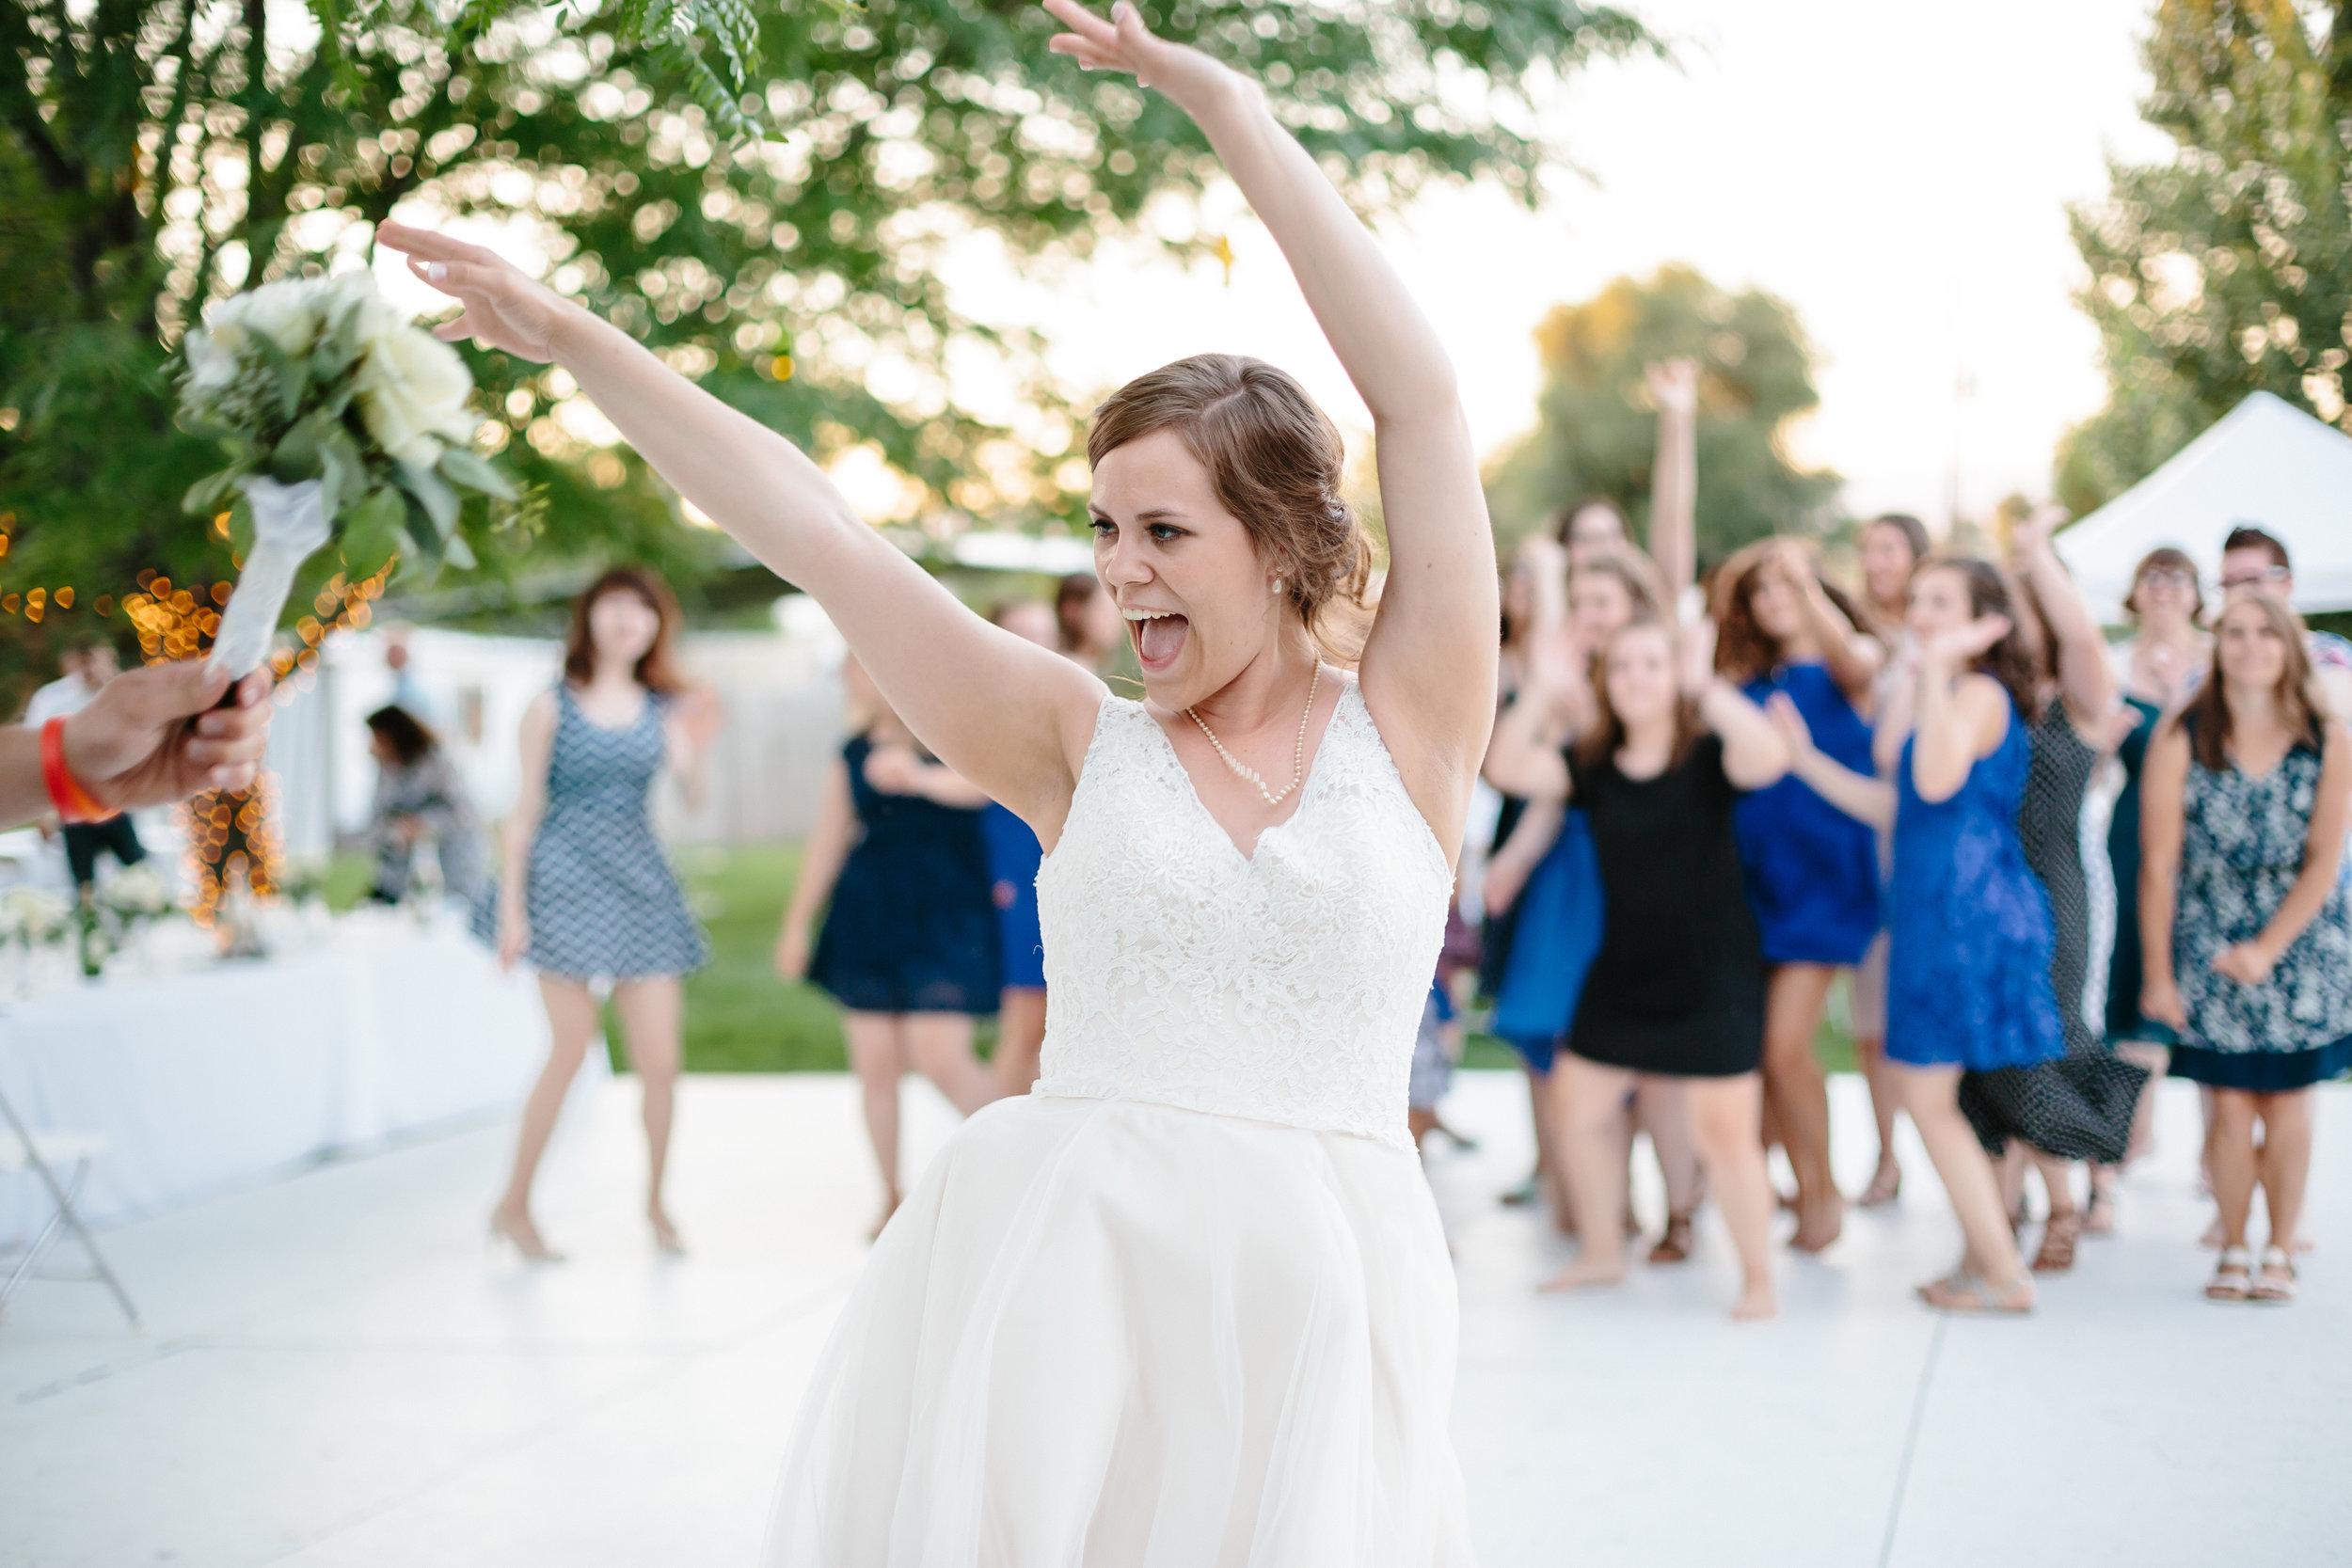 Jordan & Shantel Married - Idaho - Corrie Mick Photography-340.jpg